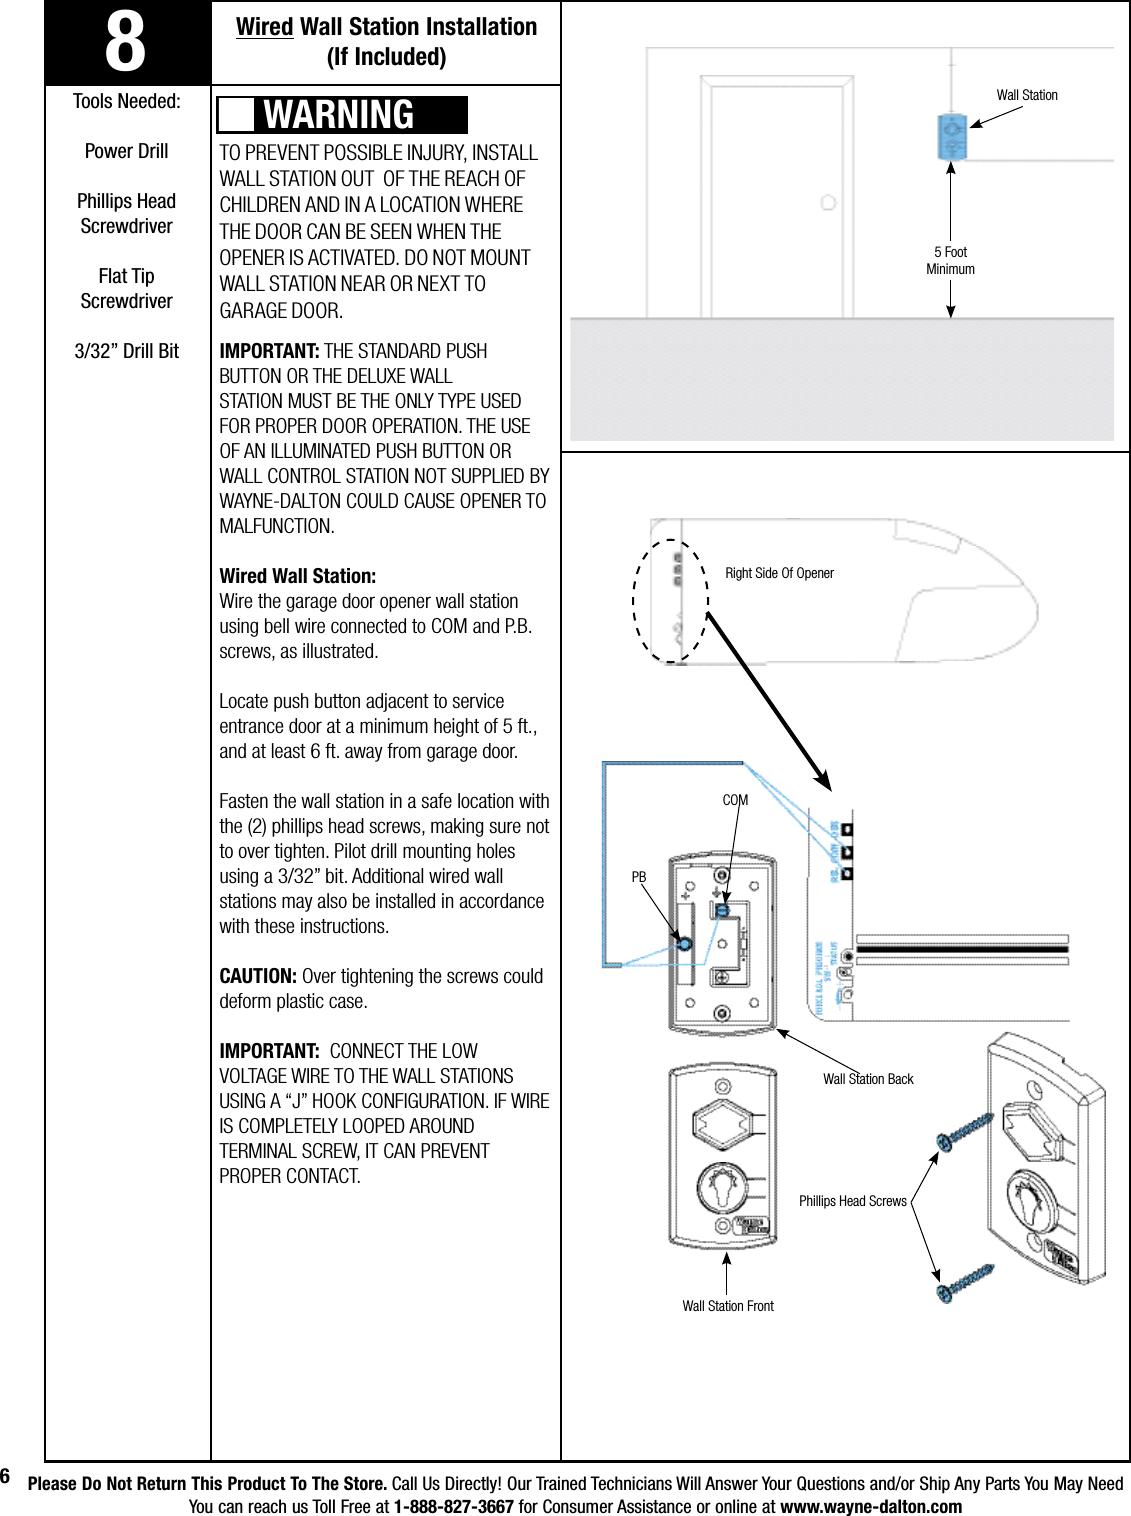 How To Reprogram A Wayne Dalton Idrive Garage Door Opener